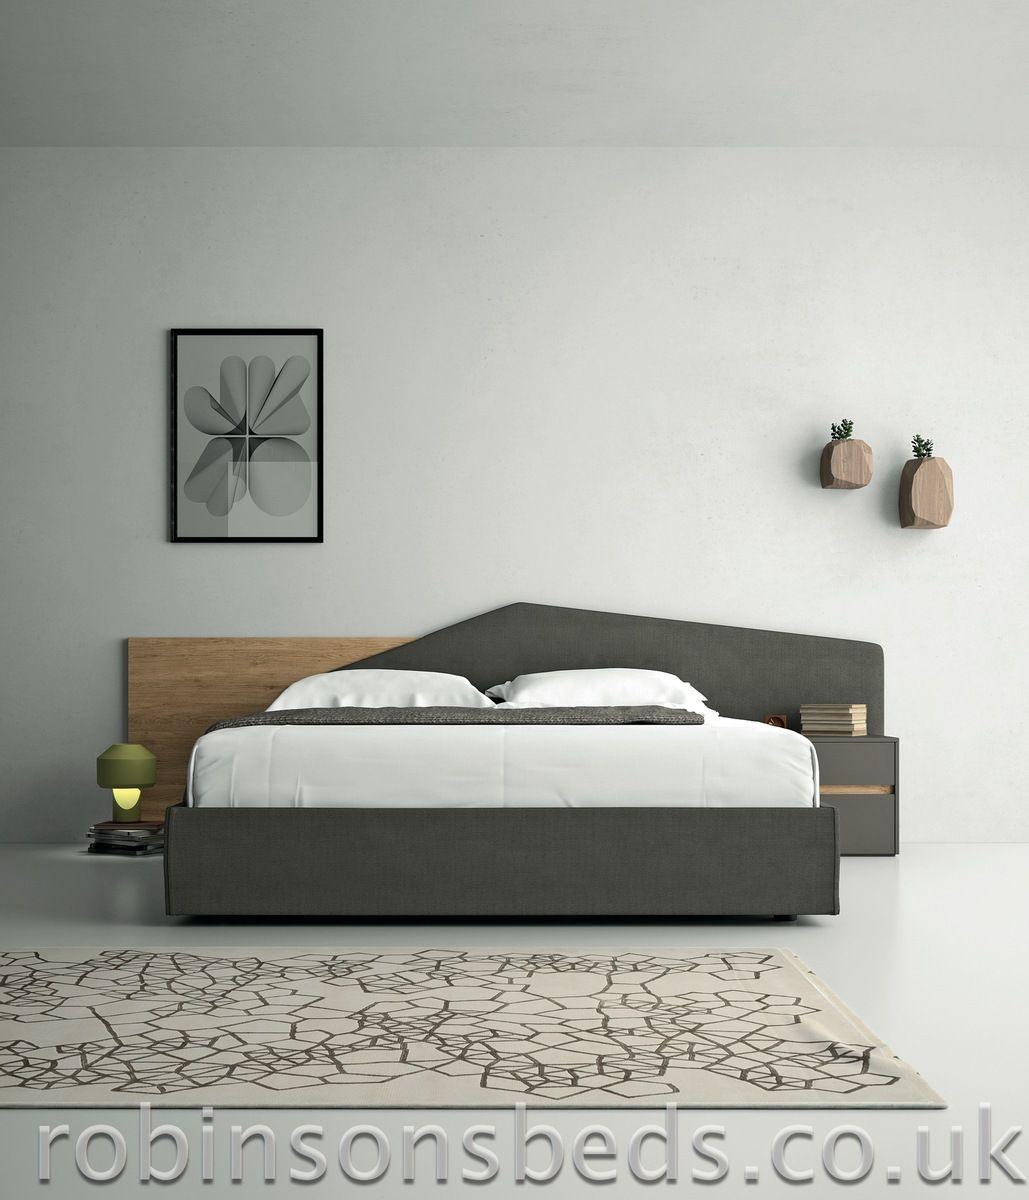 Dall'Agnese Minimal bed Italian designer futuristic beds